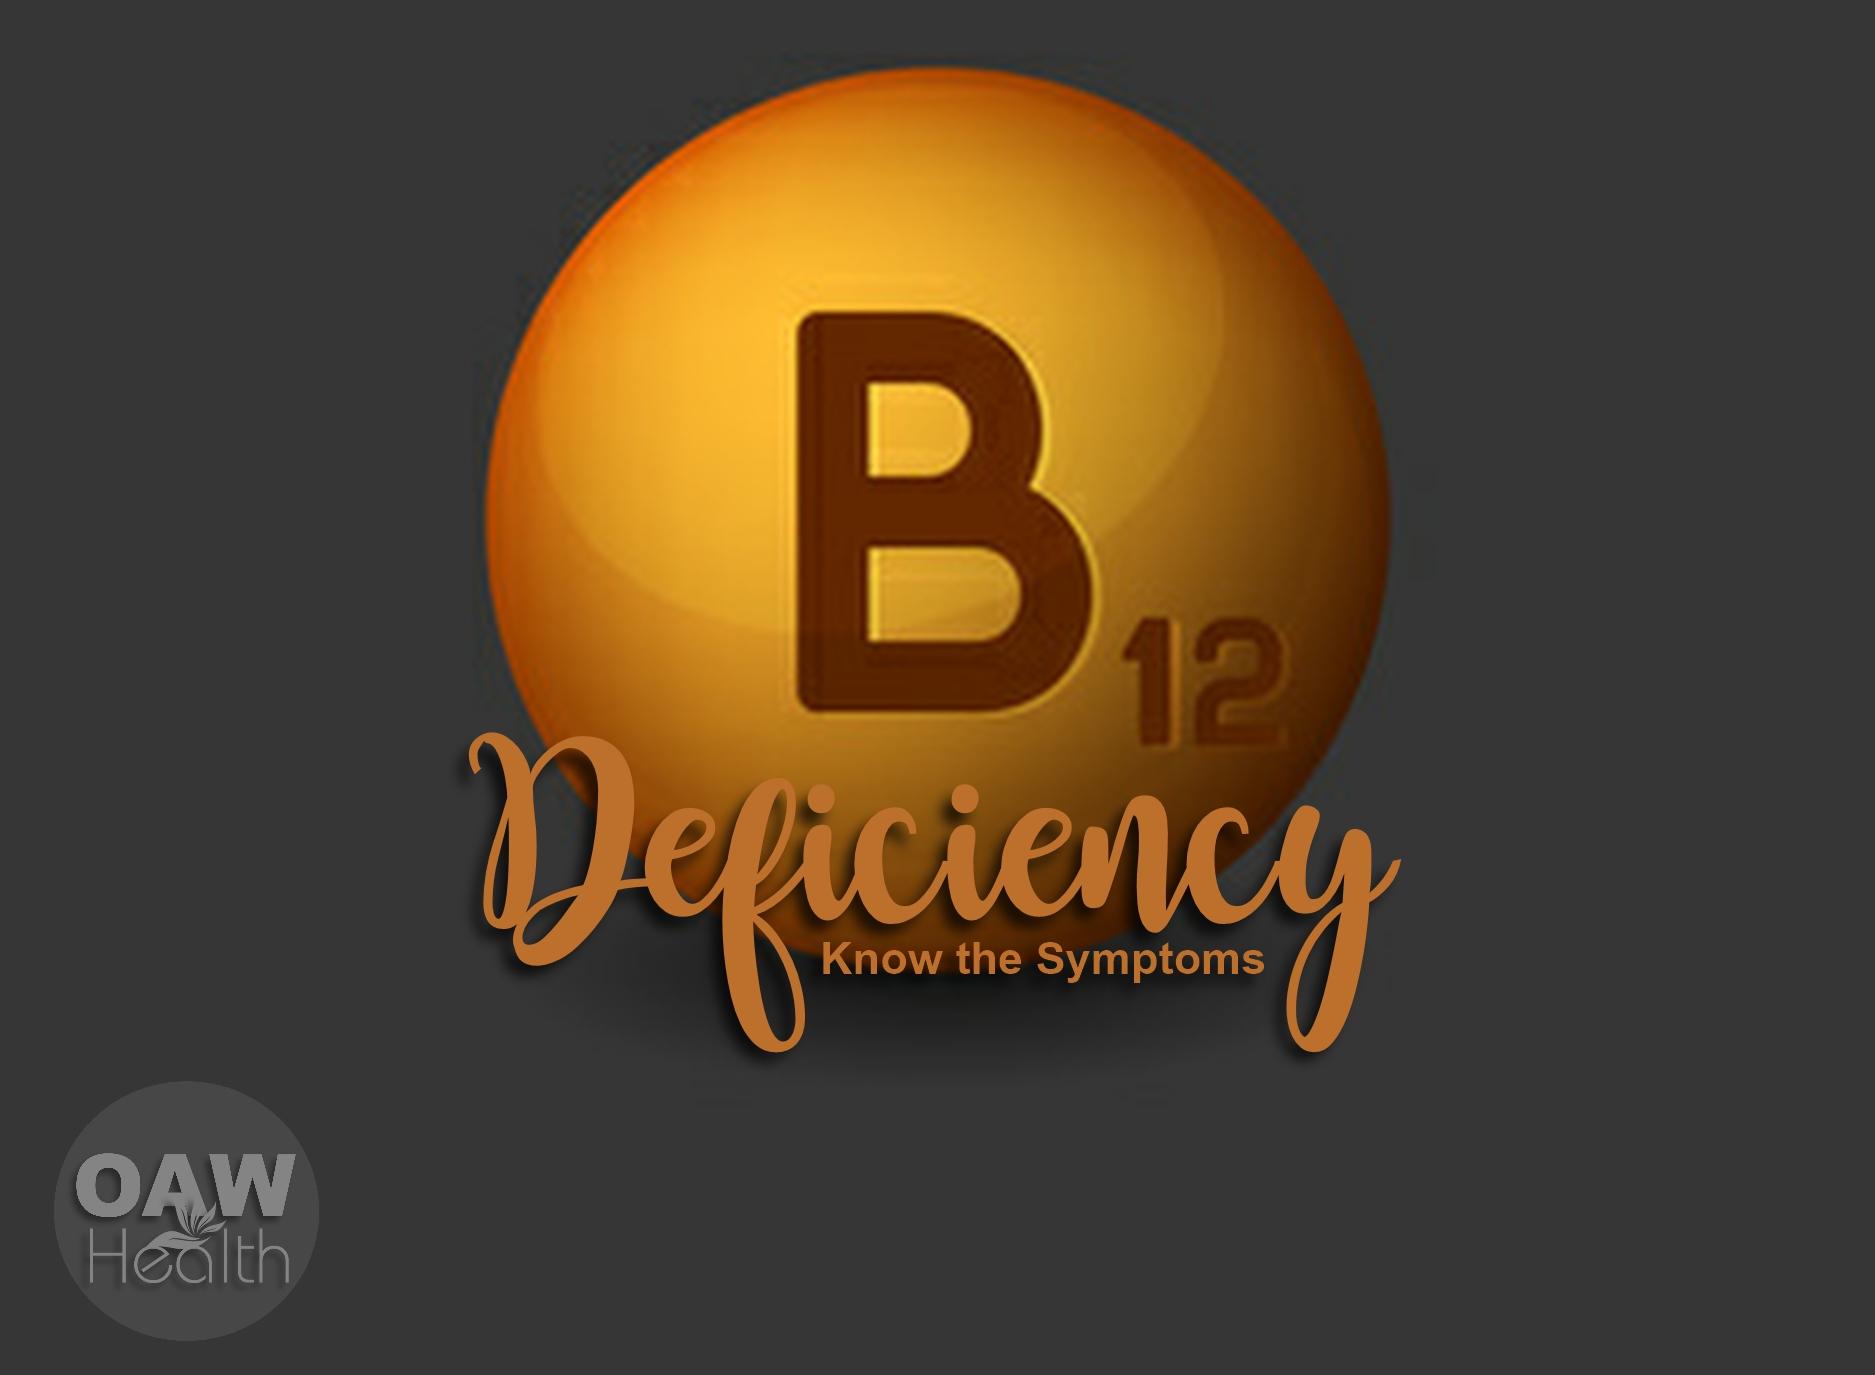 B-12 Deficiency – Know the Symptoms